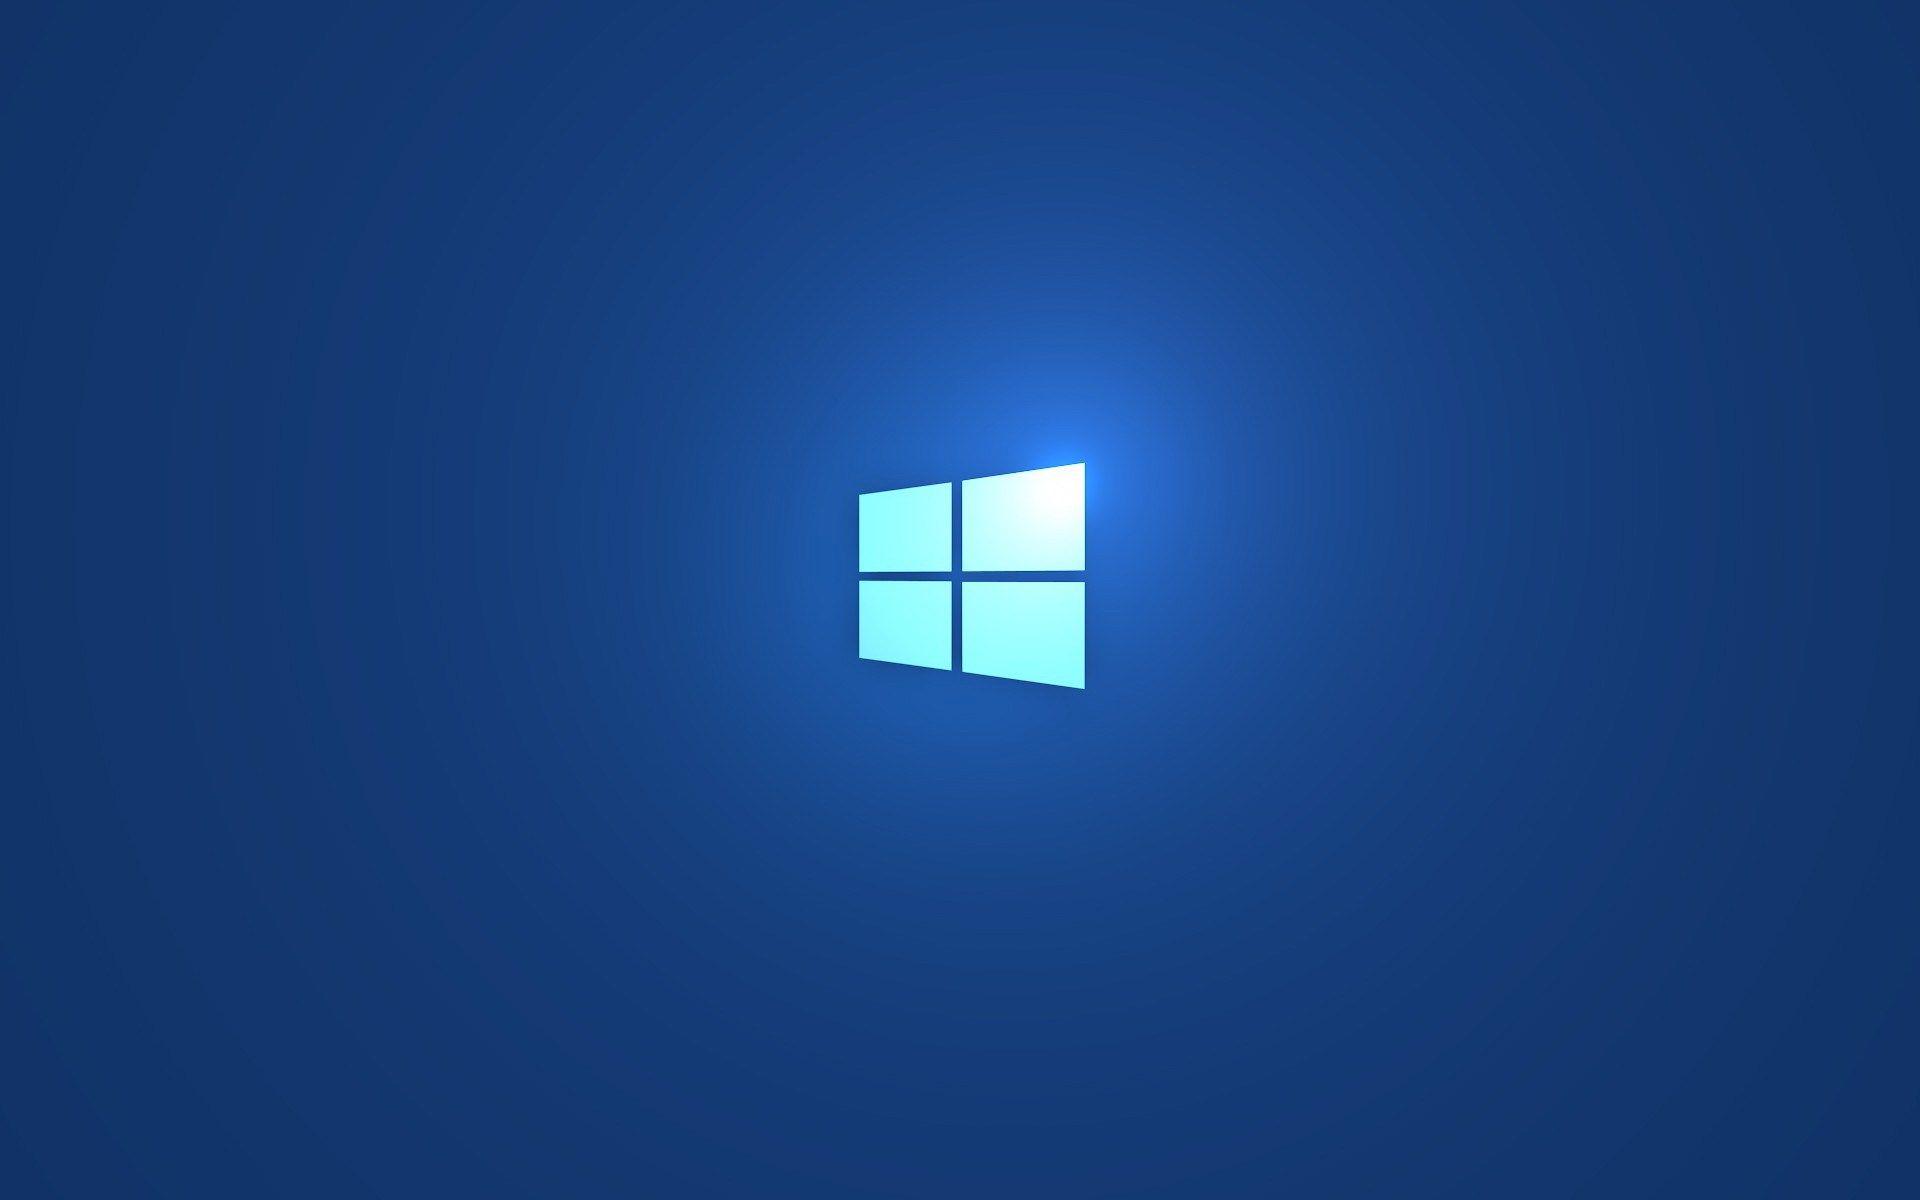 1920x1200 Free Computer Windows 8